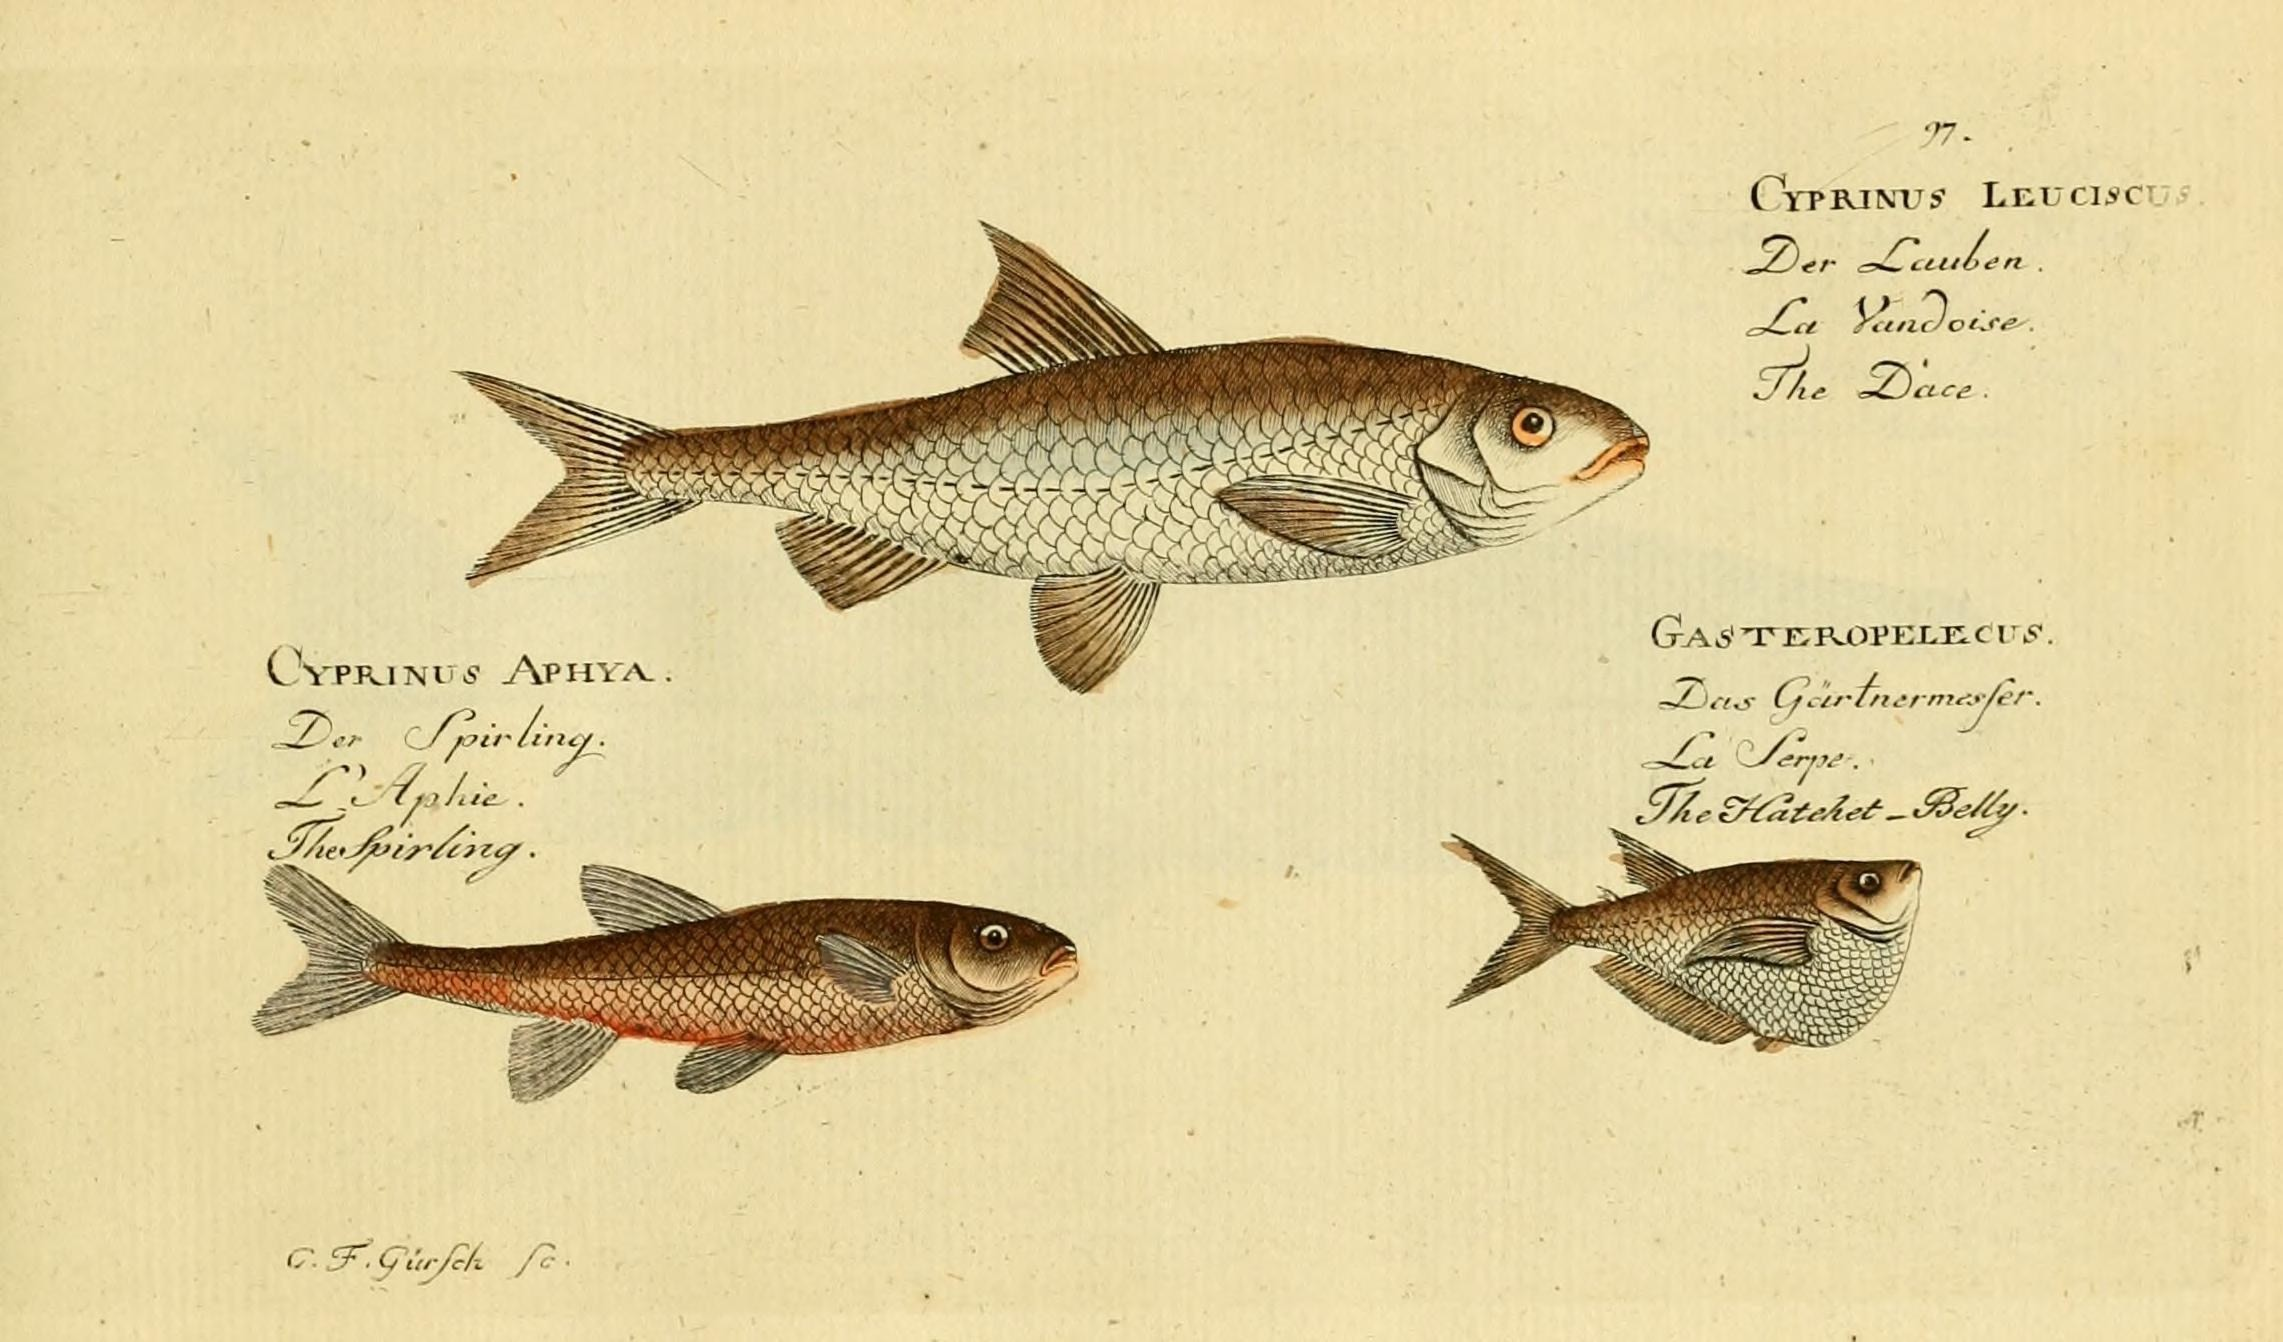 Image of Gasteropelecus